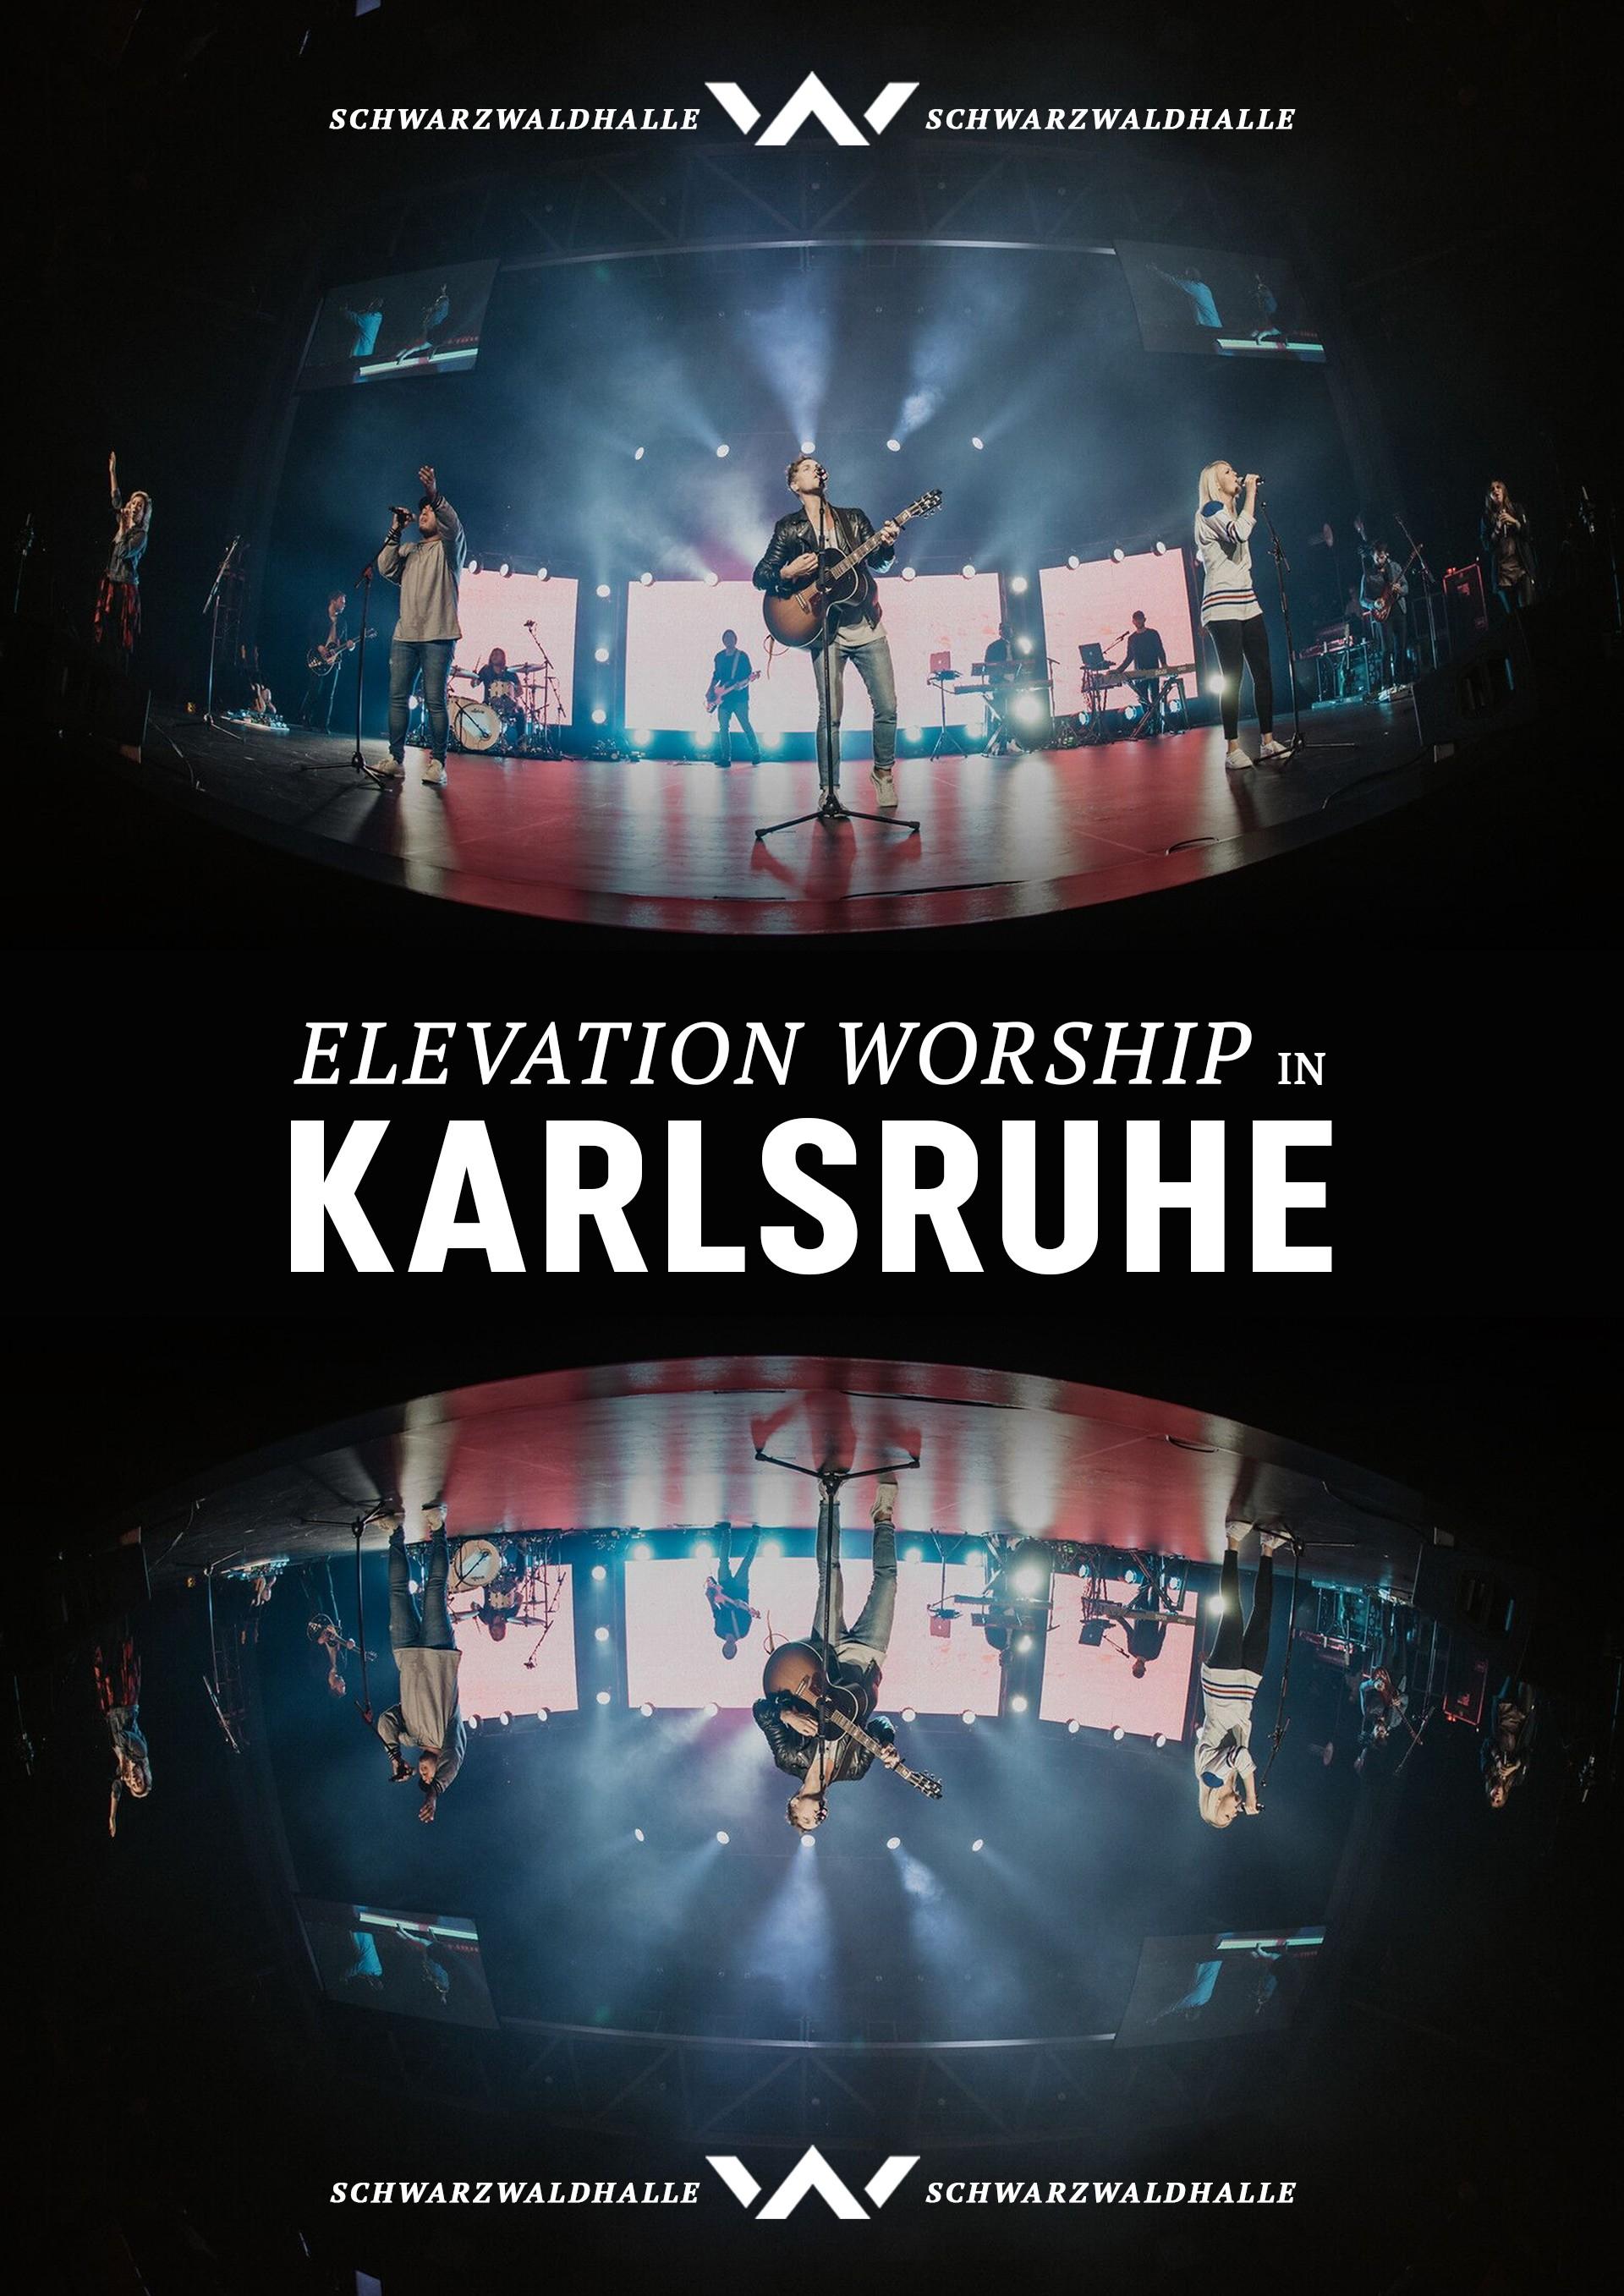 Heart Encounter - Elevation Worship in Karlsruhe